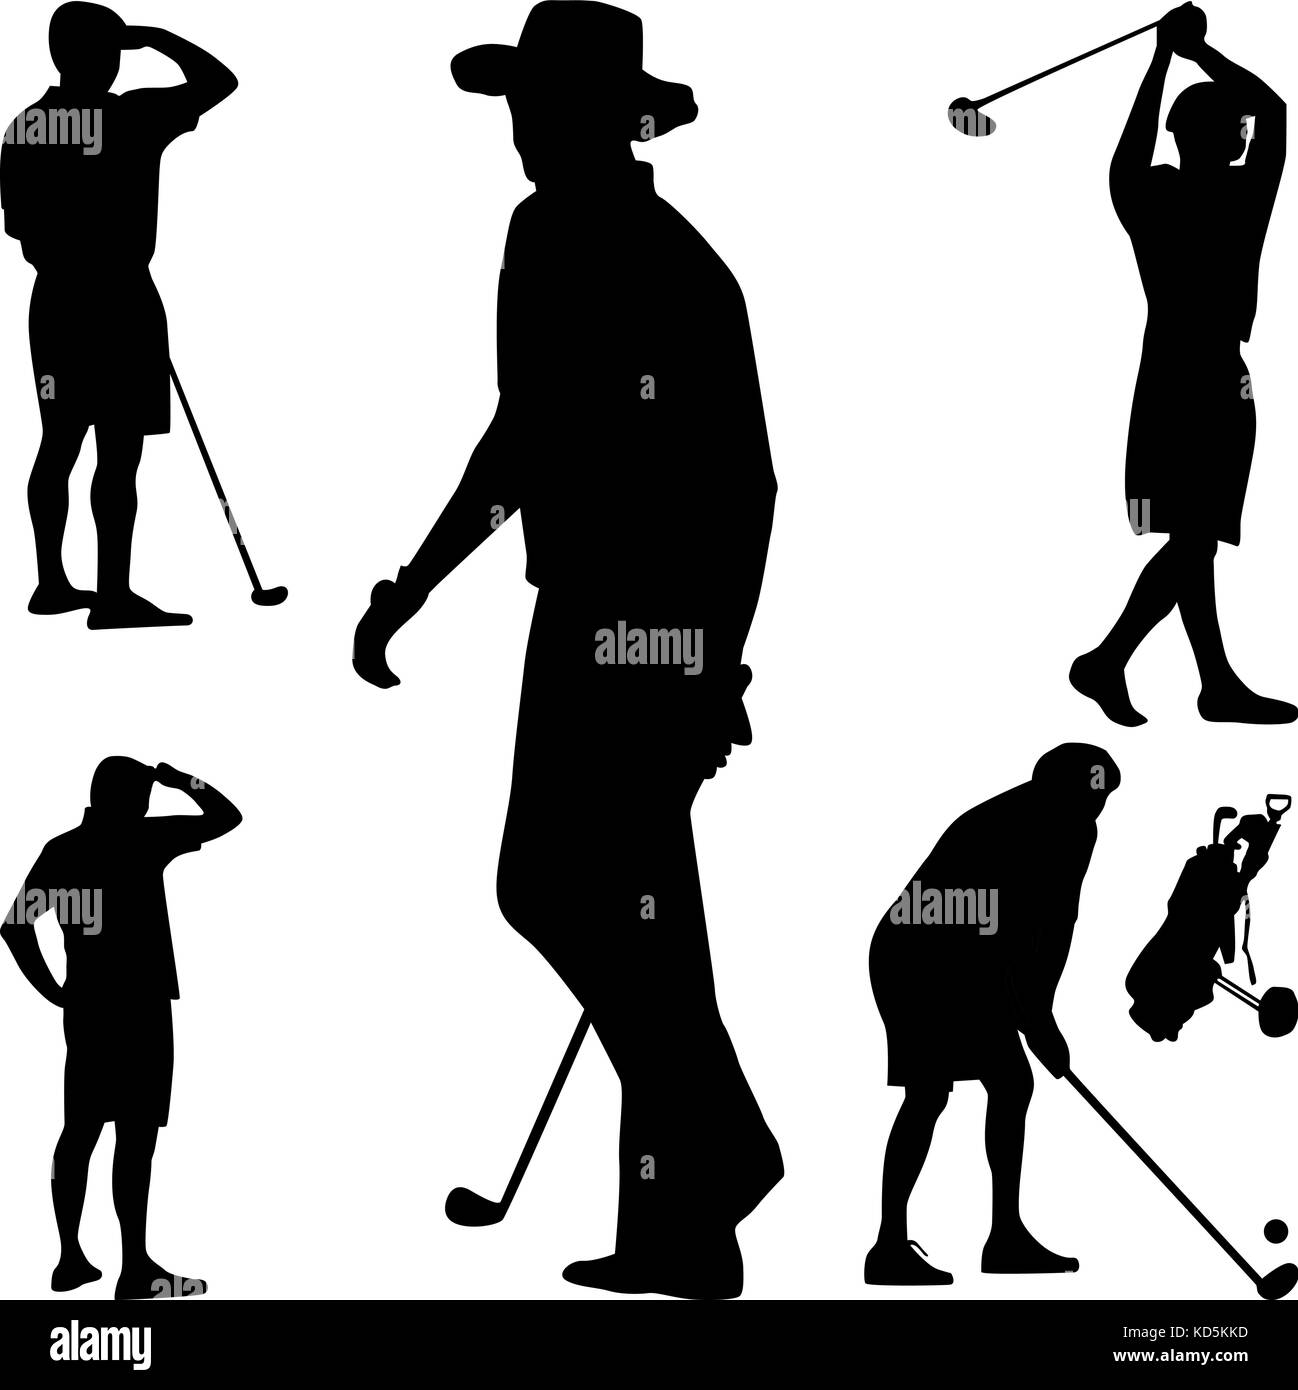 Golf Silhouette Vector Stock Vector Art Illustration Vector Image